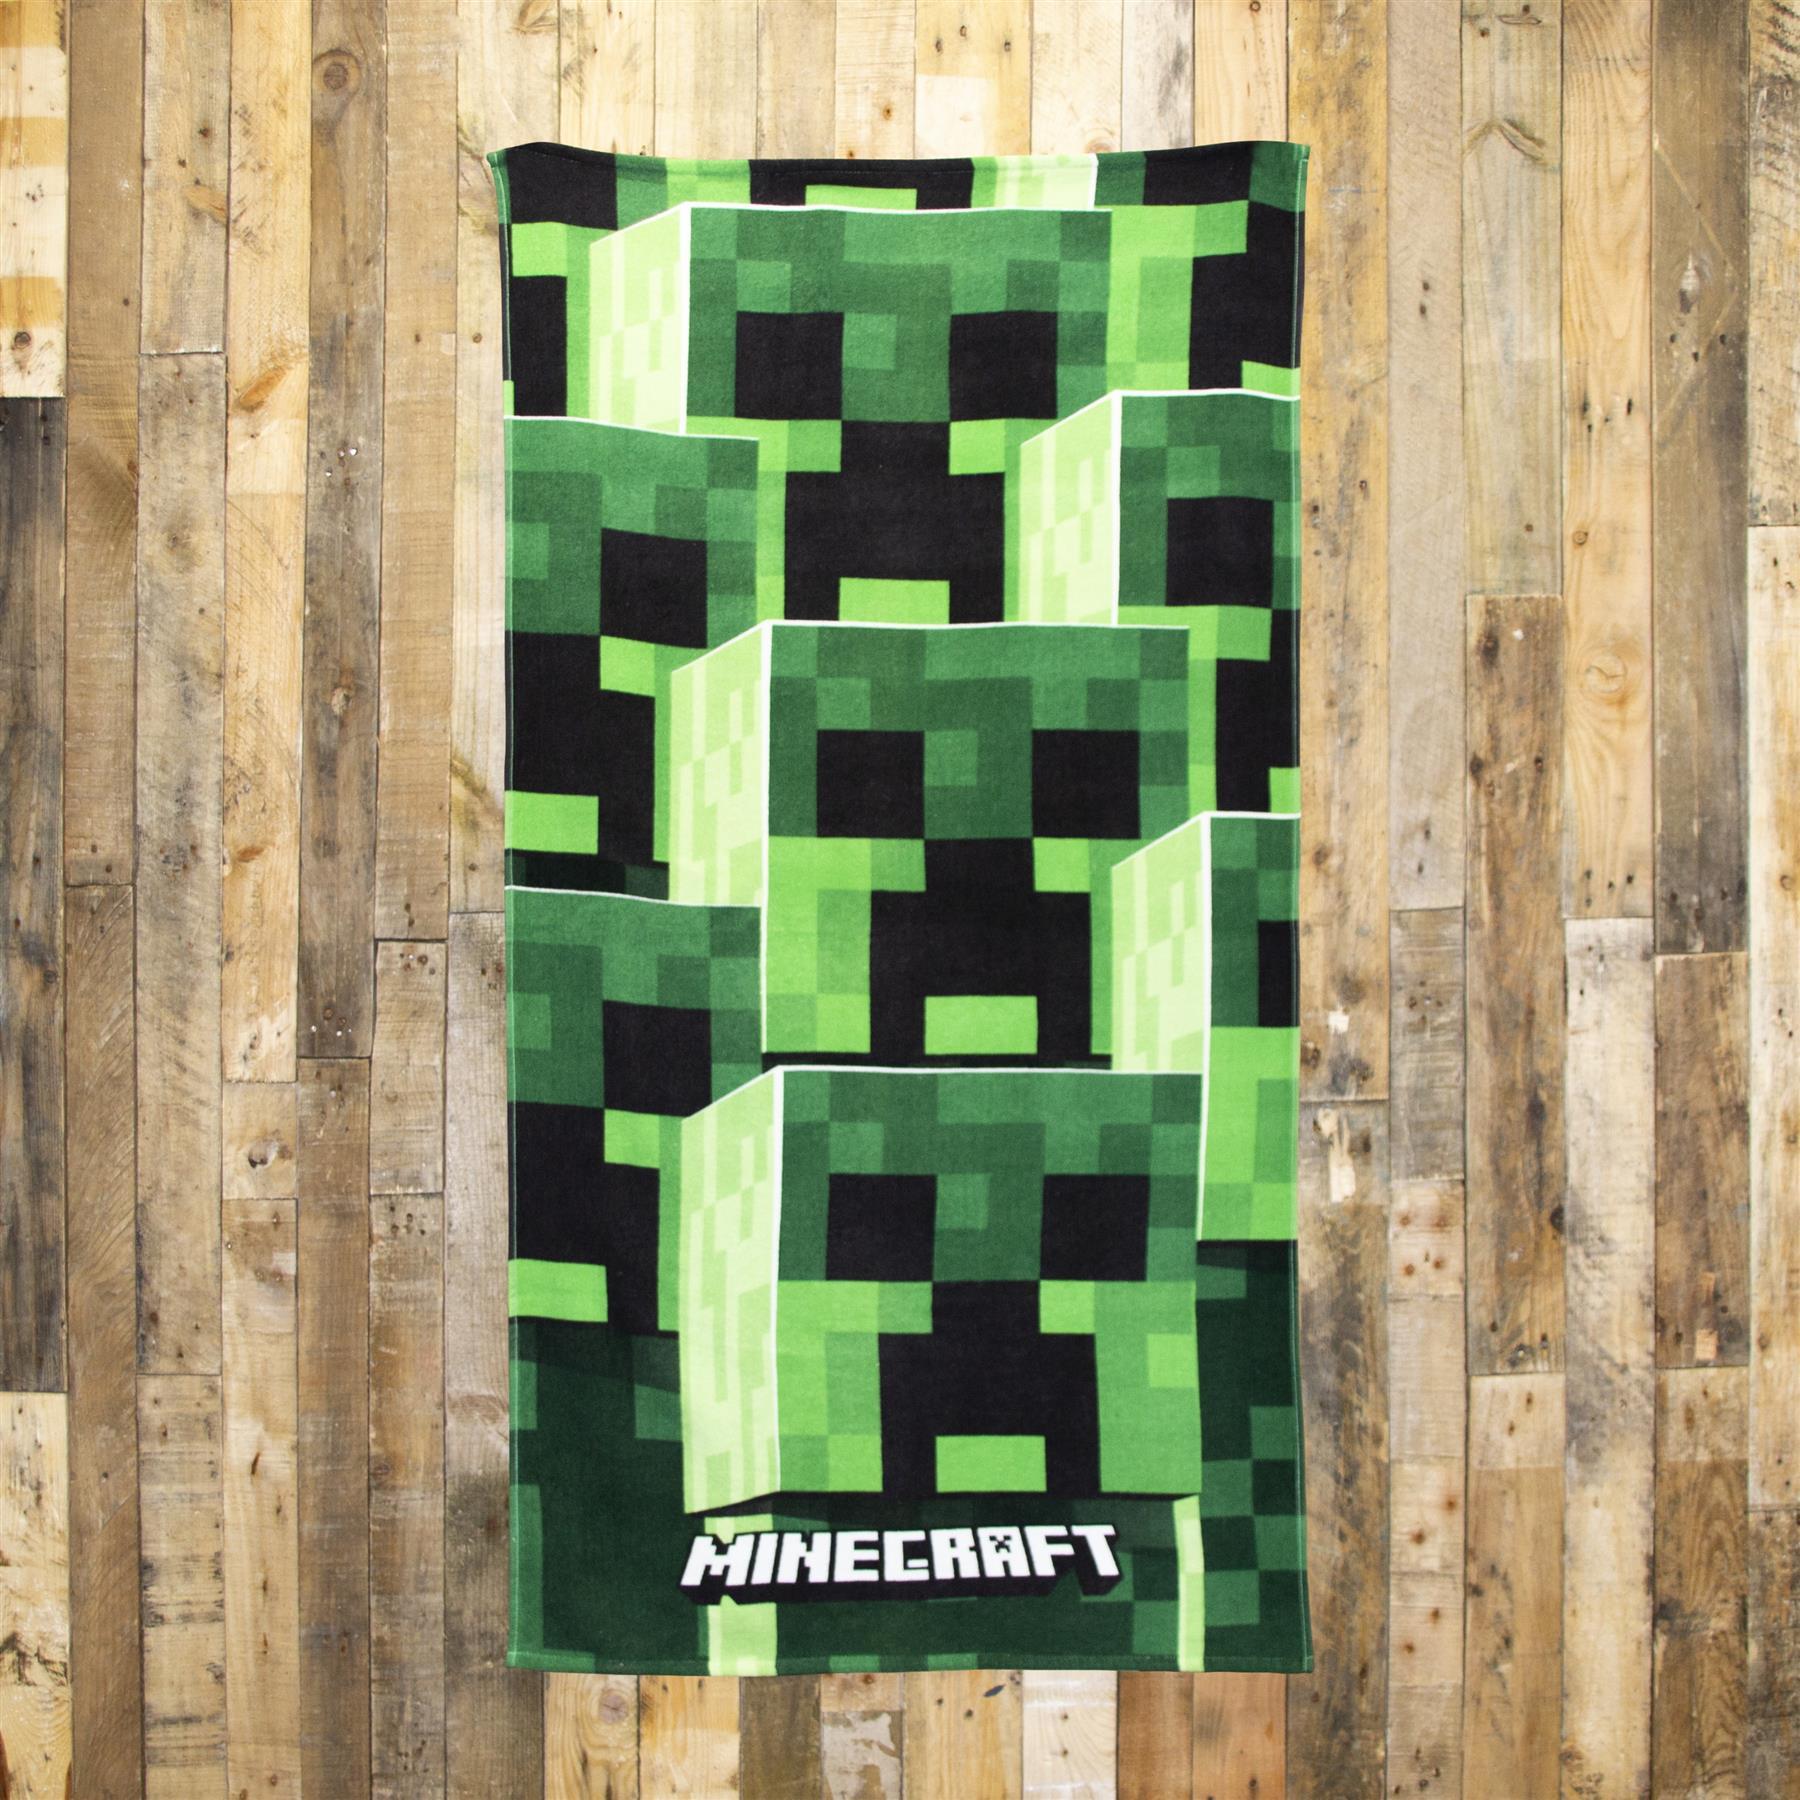 miniatura 7 - Minecraft Biancheria da letto Creeper PIUMONI Asciugamano Cuscino Coperta-venduta separatamente